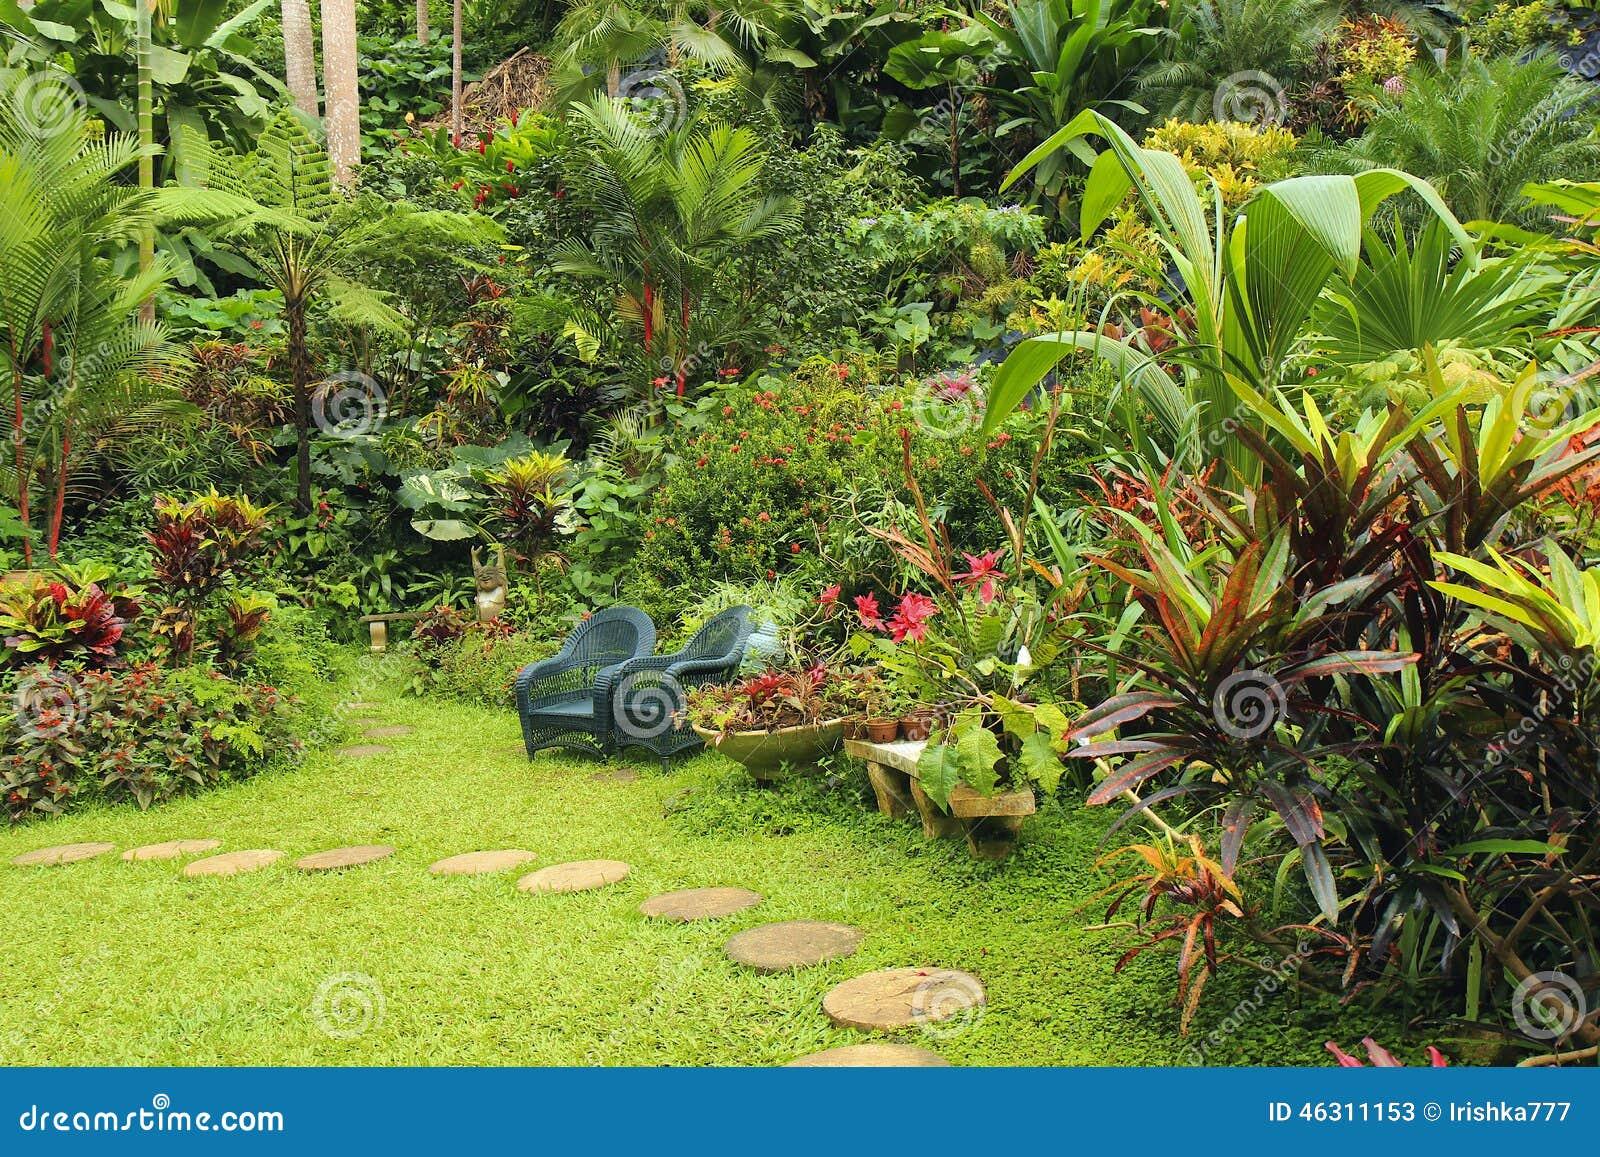 botanical garden in barbados caribbean stock image image of flowers paradise 46311153. Black Bedroom Furniture Sets. Home Design Ideas